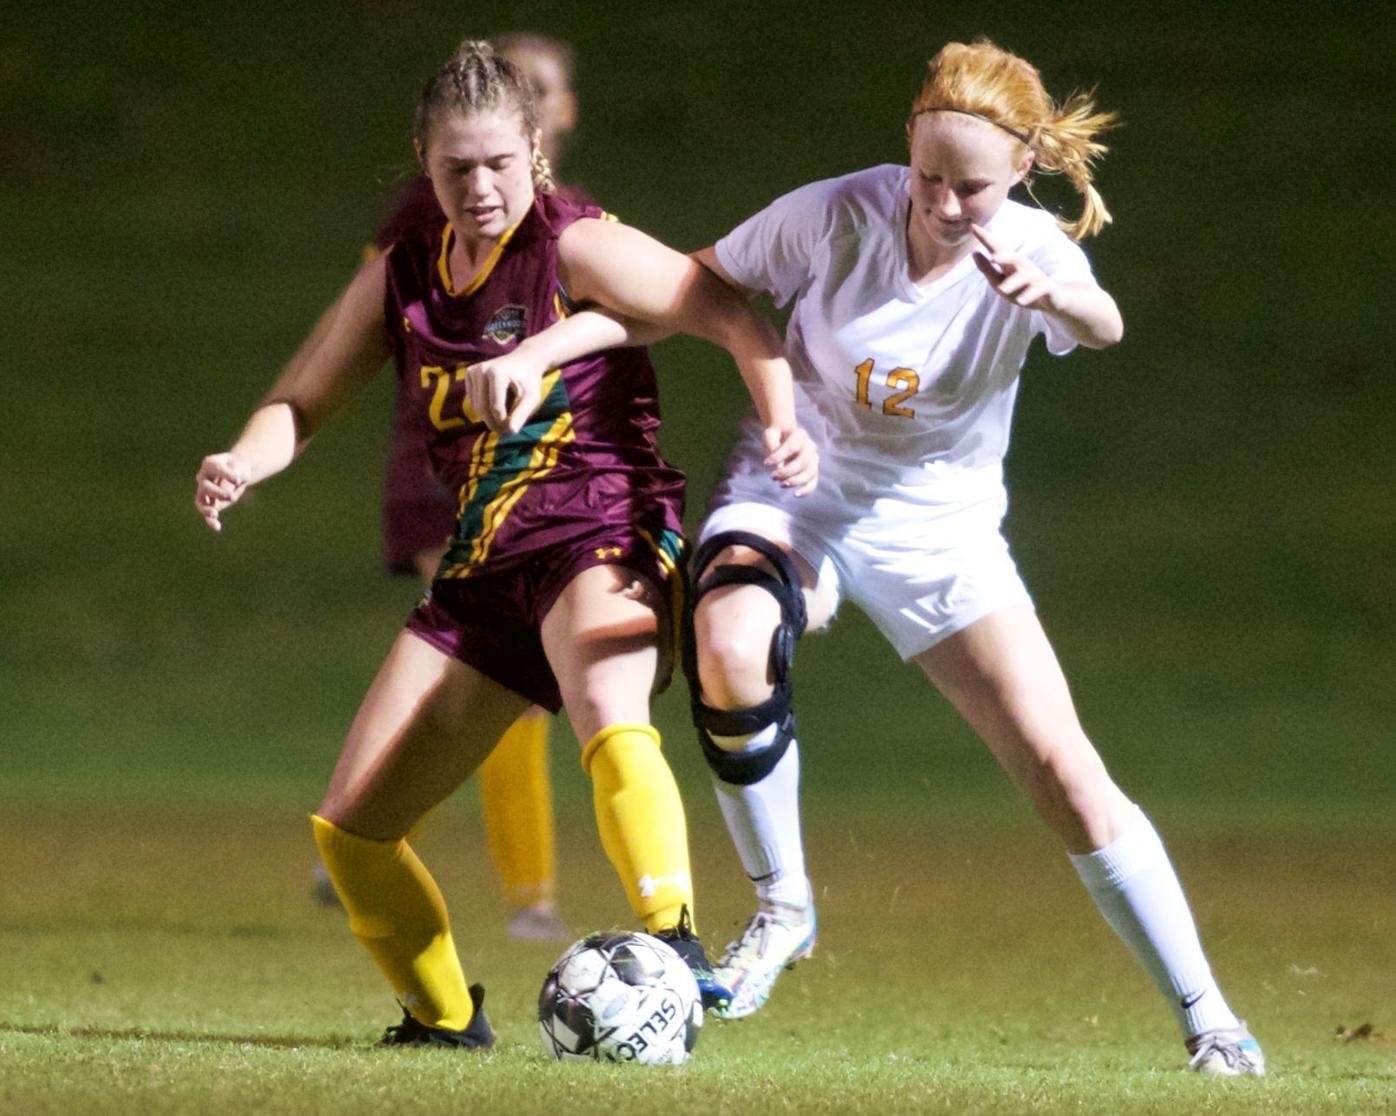 211012-sports-Greenwood vs. Barren Region 4 Girls' Soccer Tournament Semifinals_outbound 4.jpg